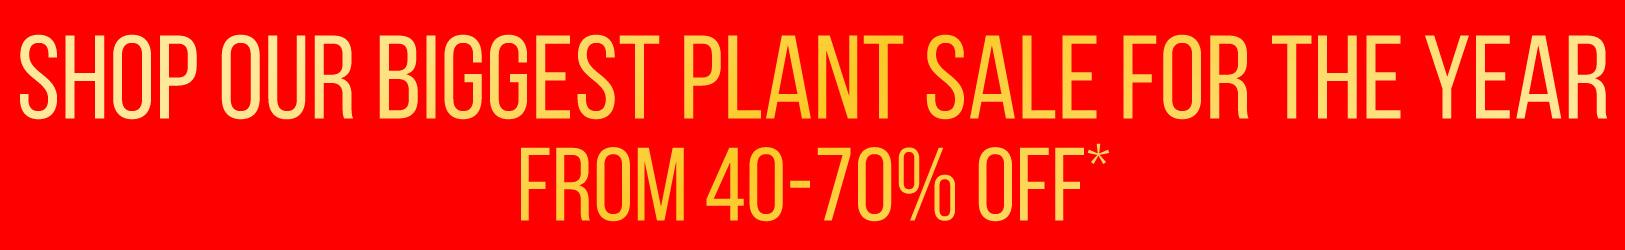 lower - biggest plant sale class=